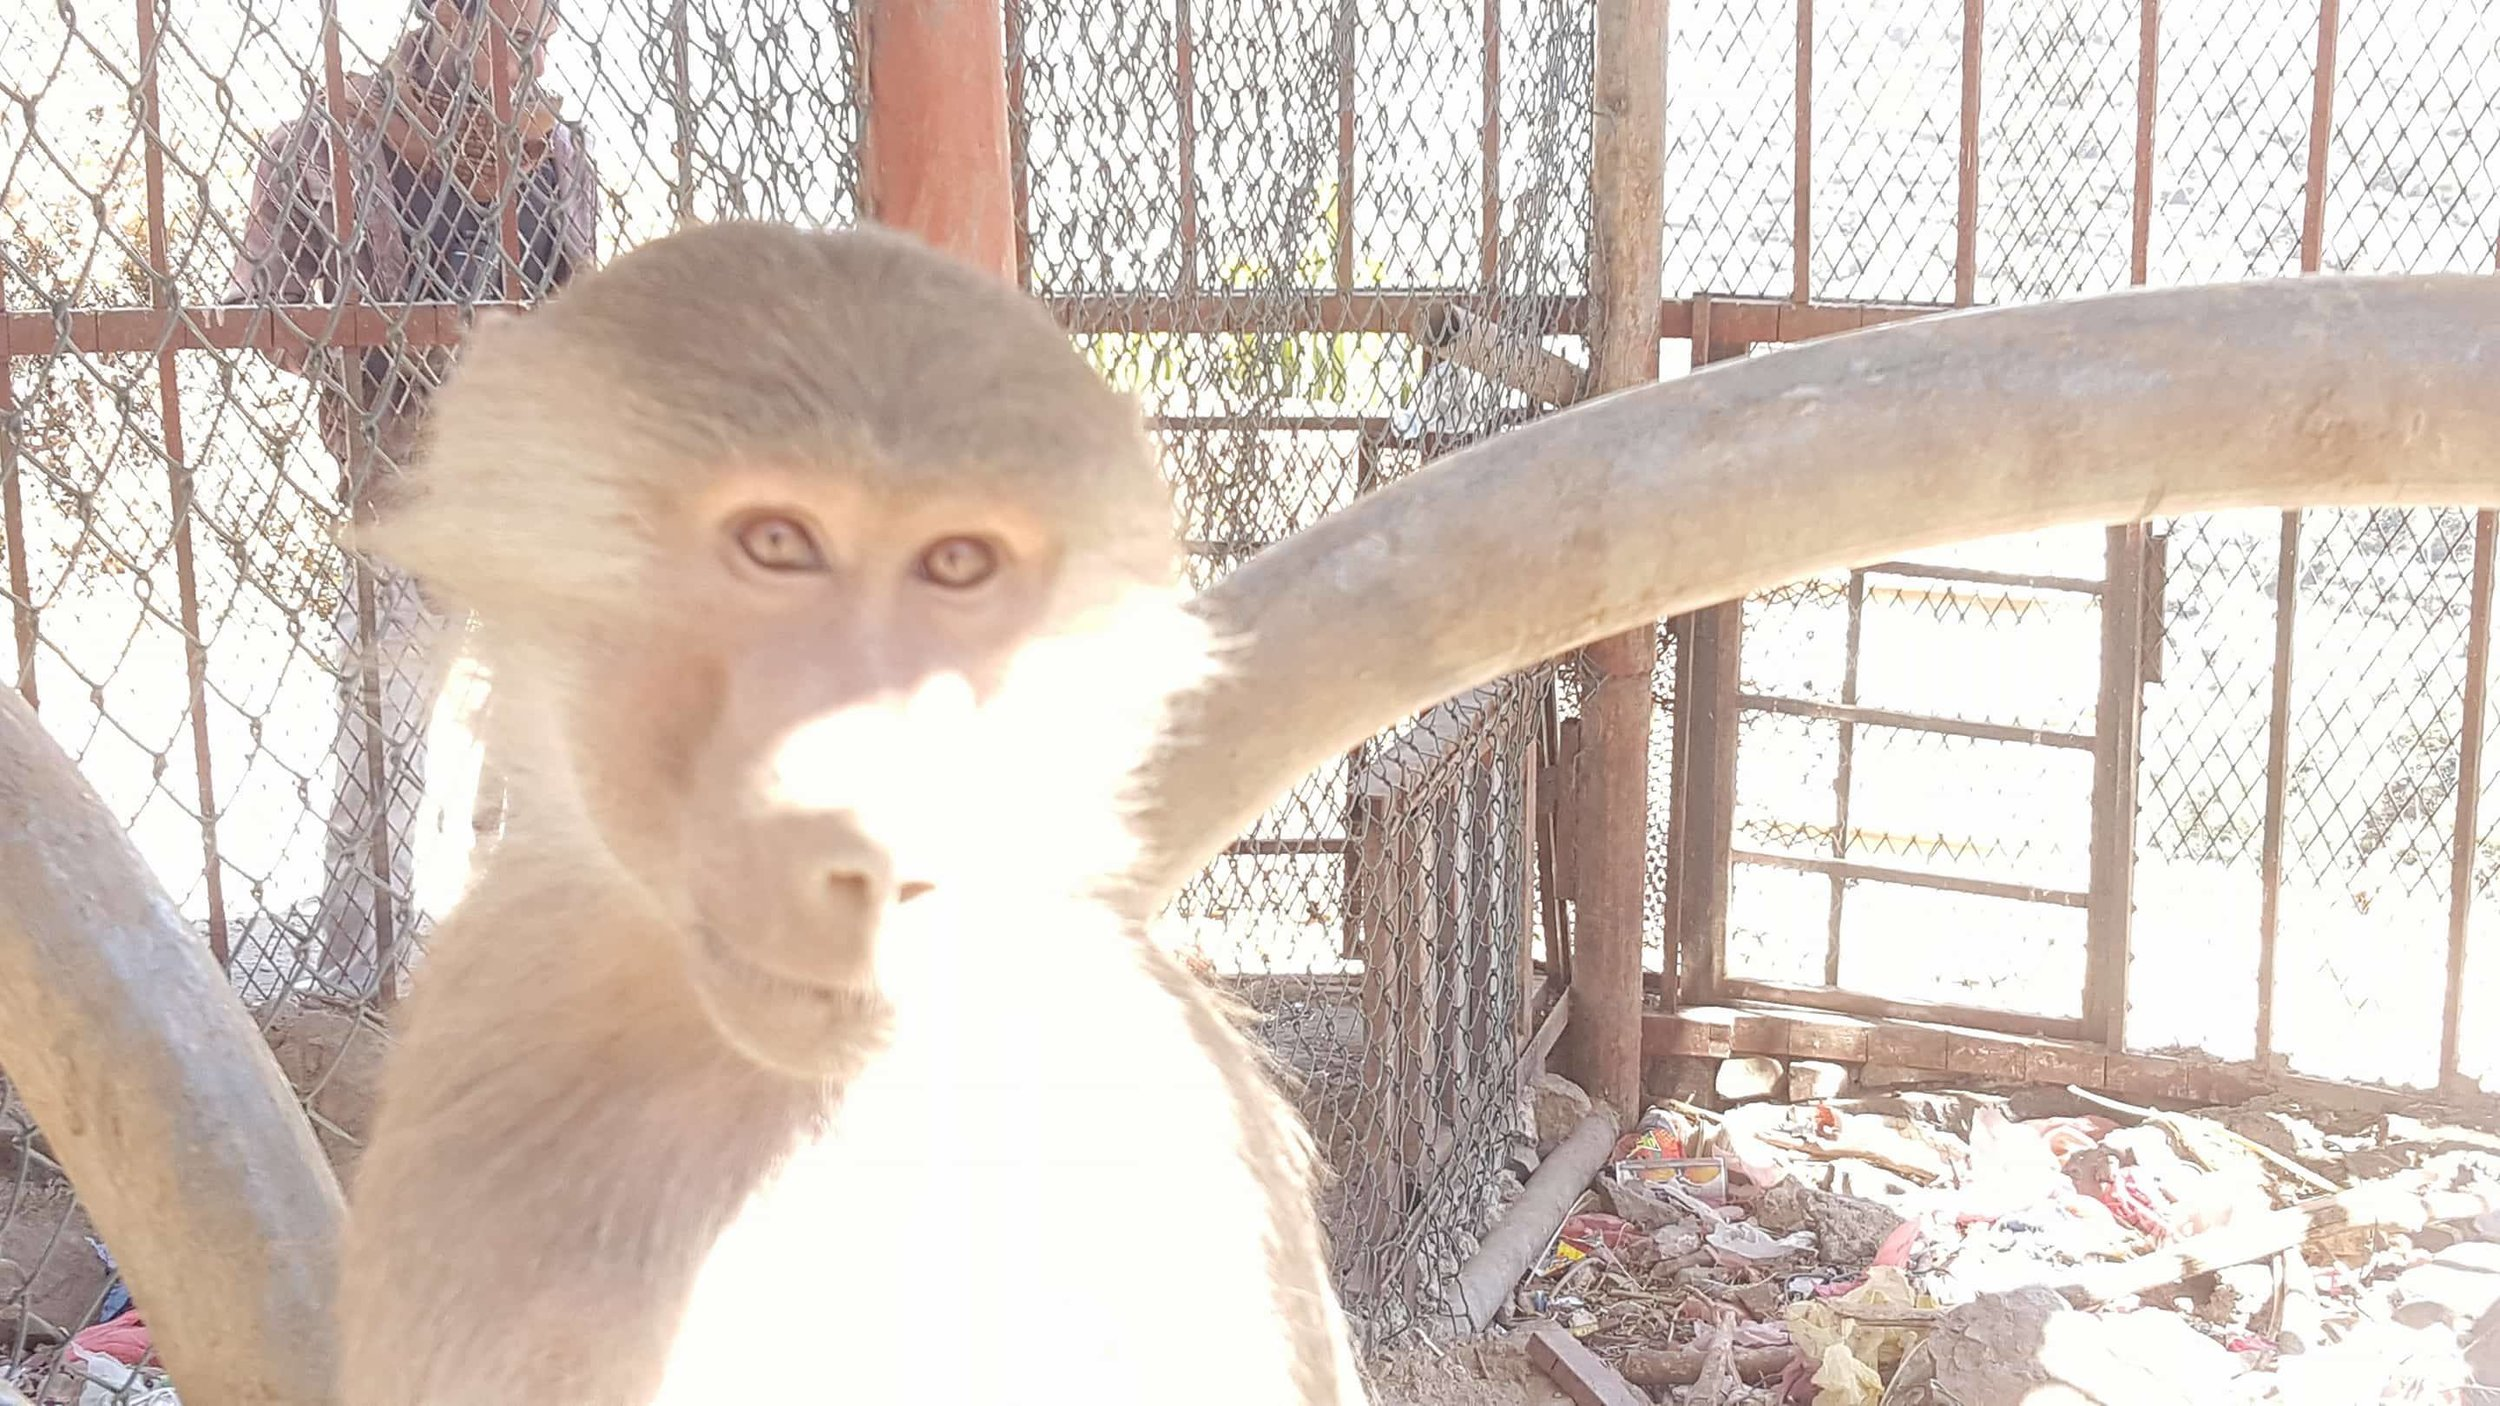 ibb zoo baboon hungry 20 DEC 2017 Yemen OWAP AR salman 's pics.jpg